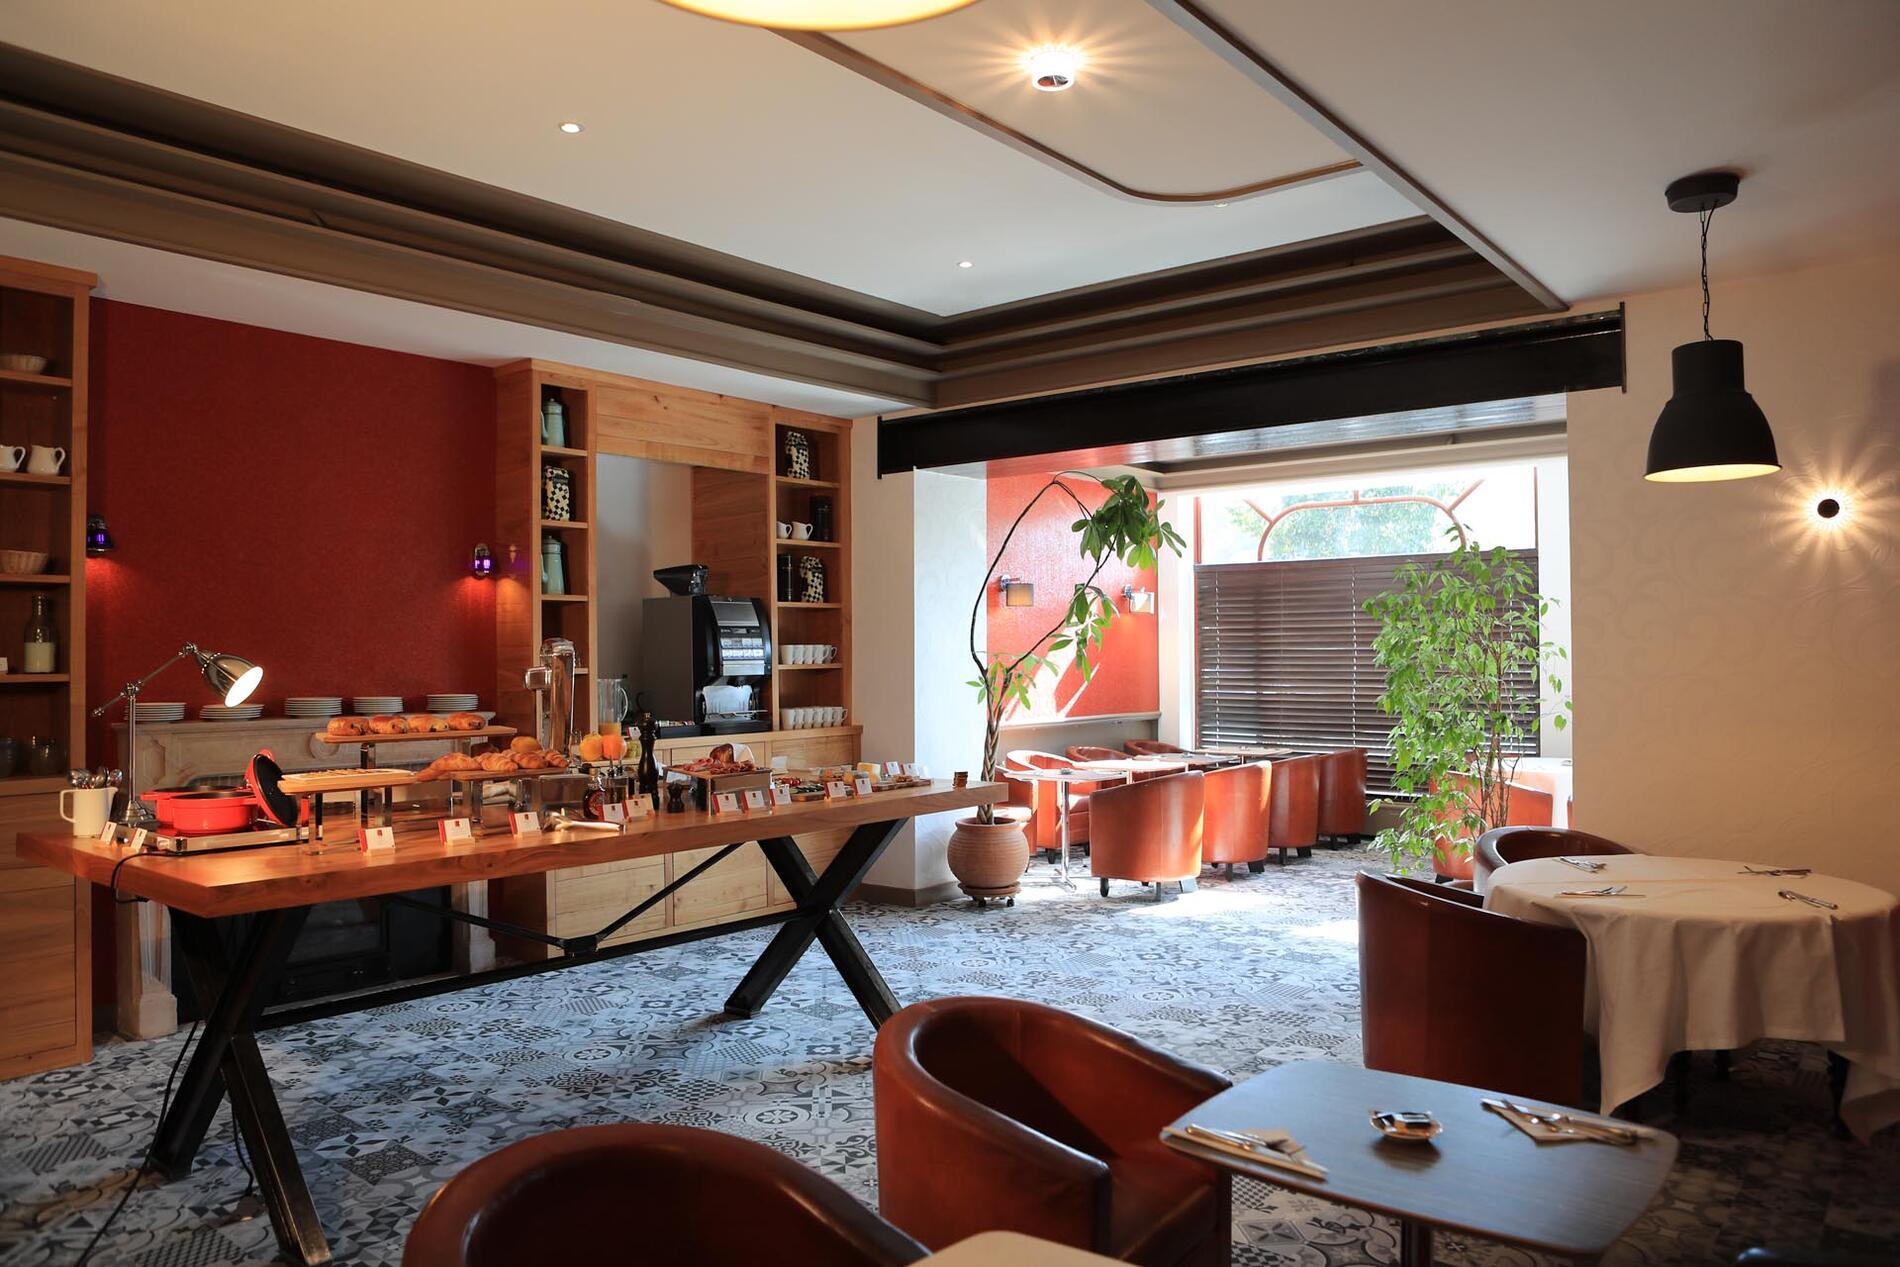 Breakfast at The Originals Boutique, Grand Hôtel Saint-Pierre